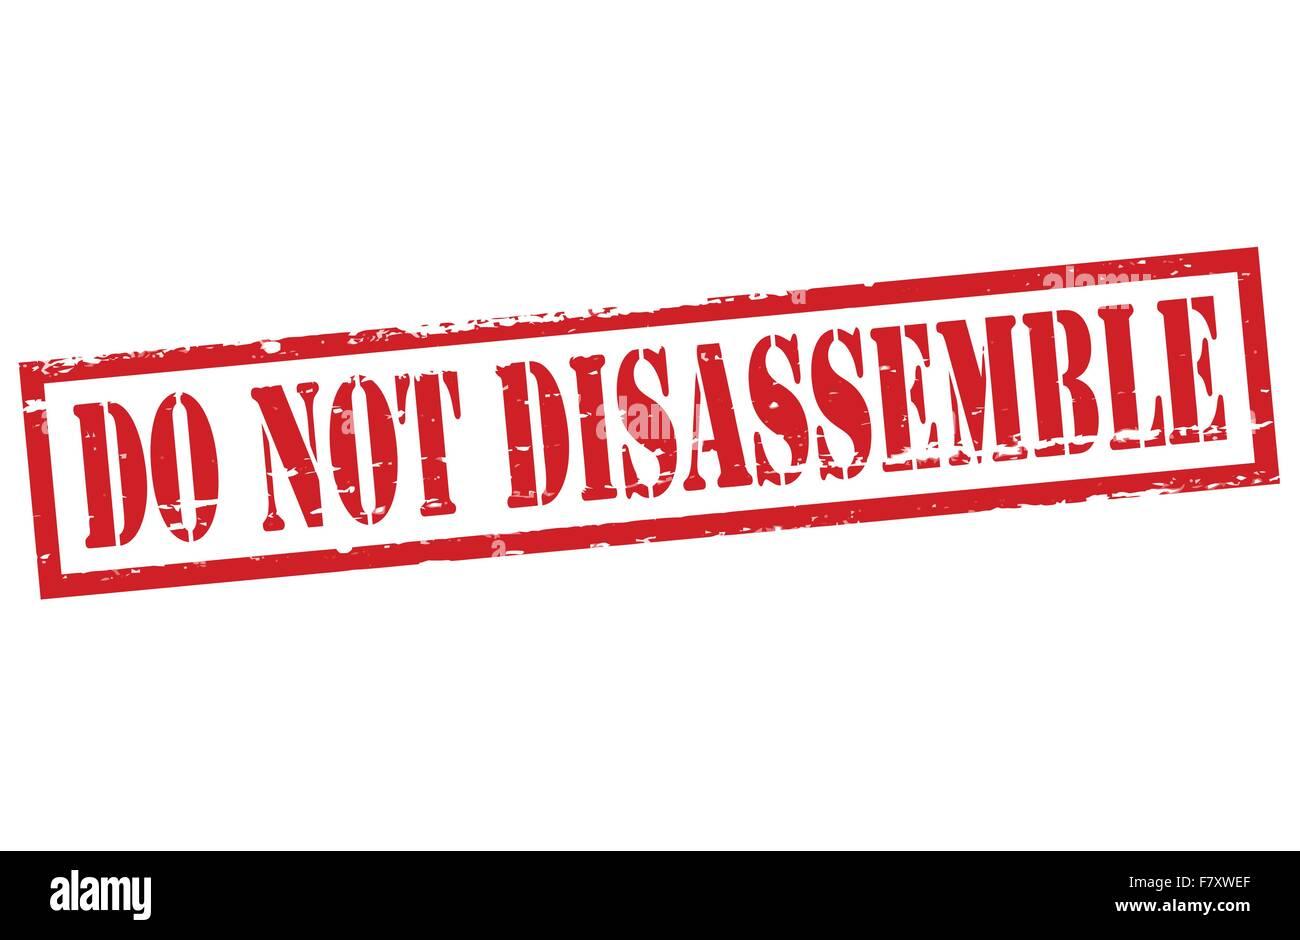 Do not disassemble - Stock Image